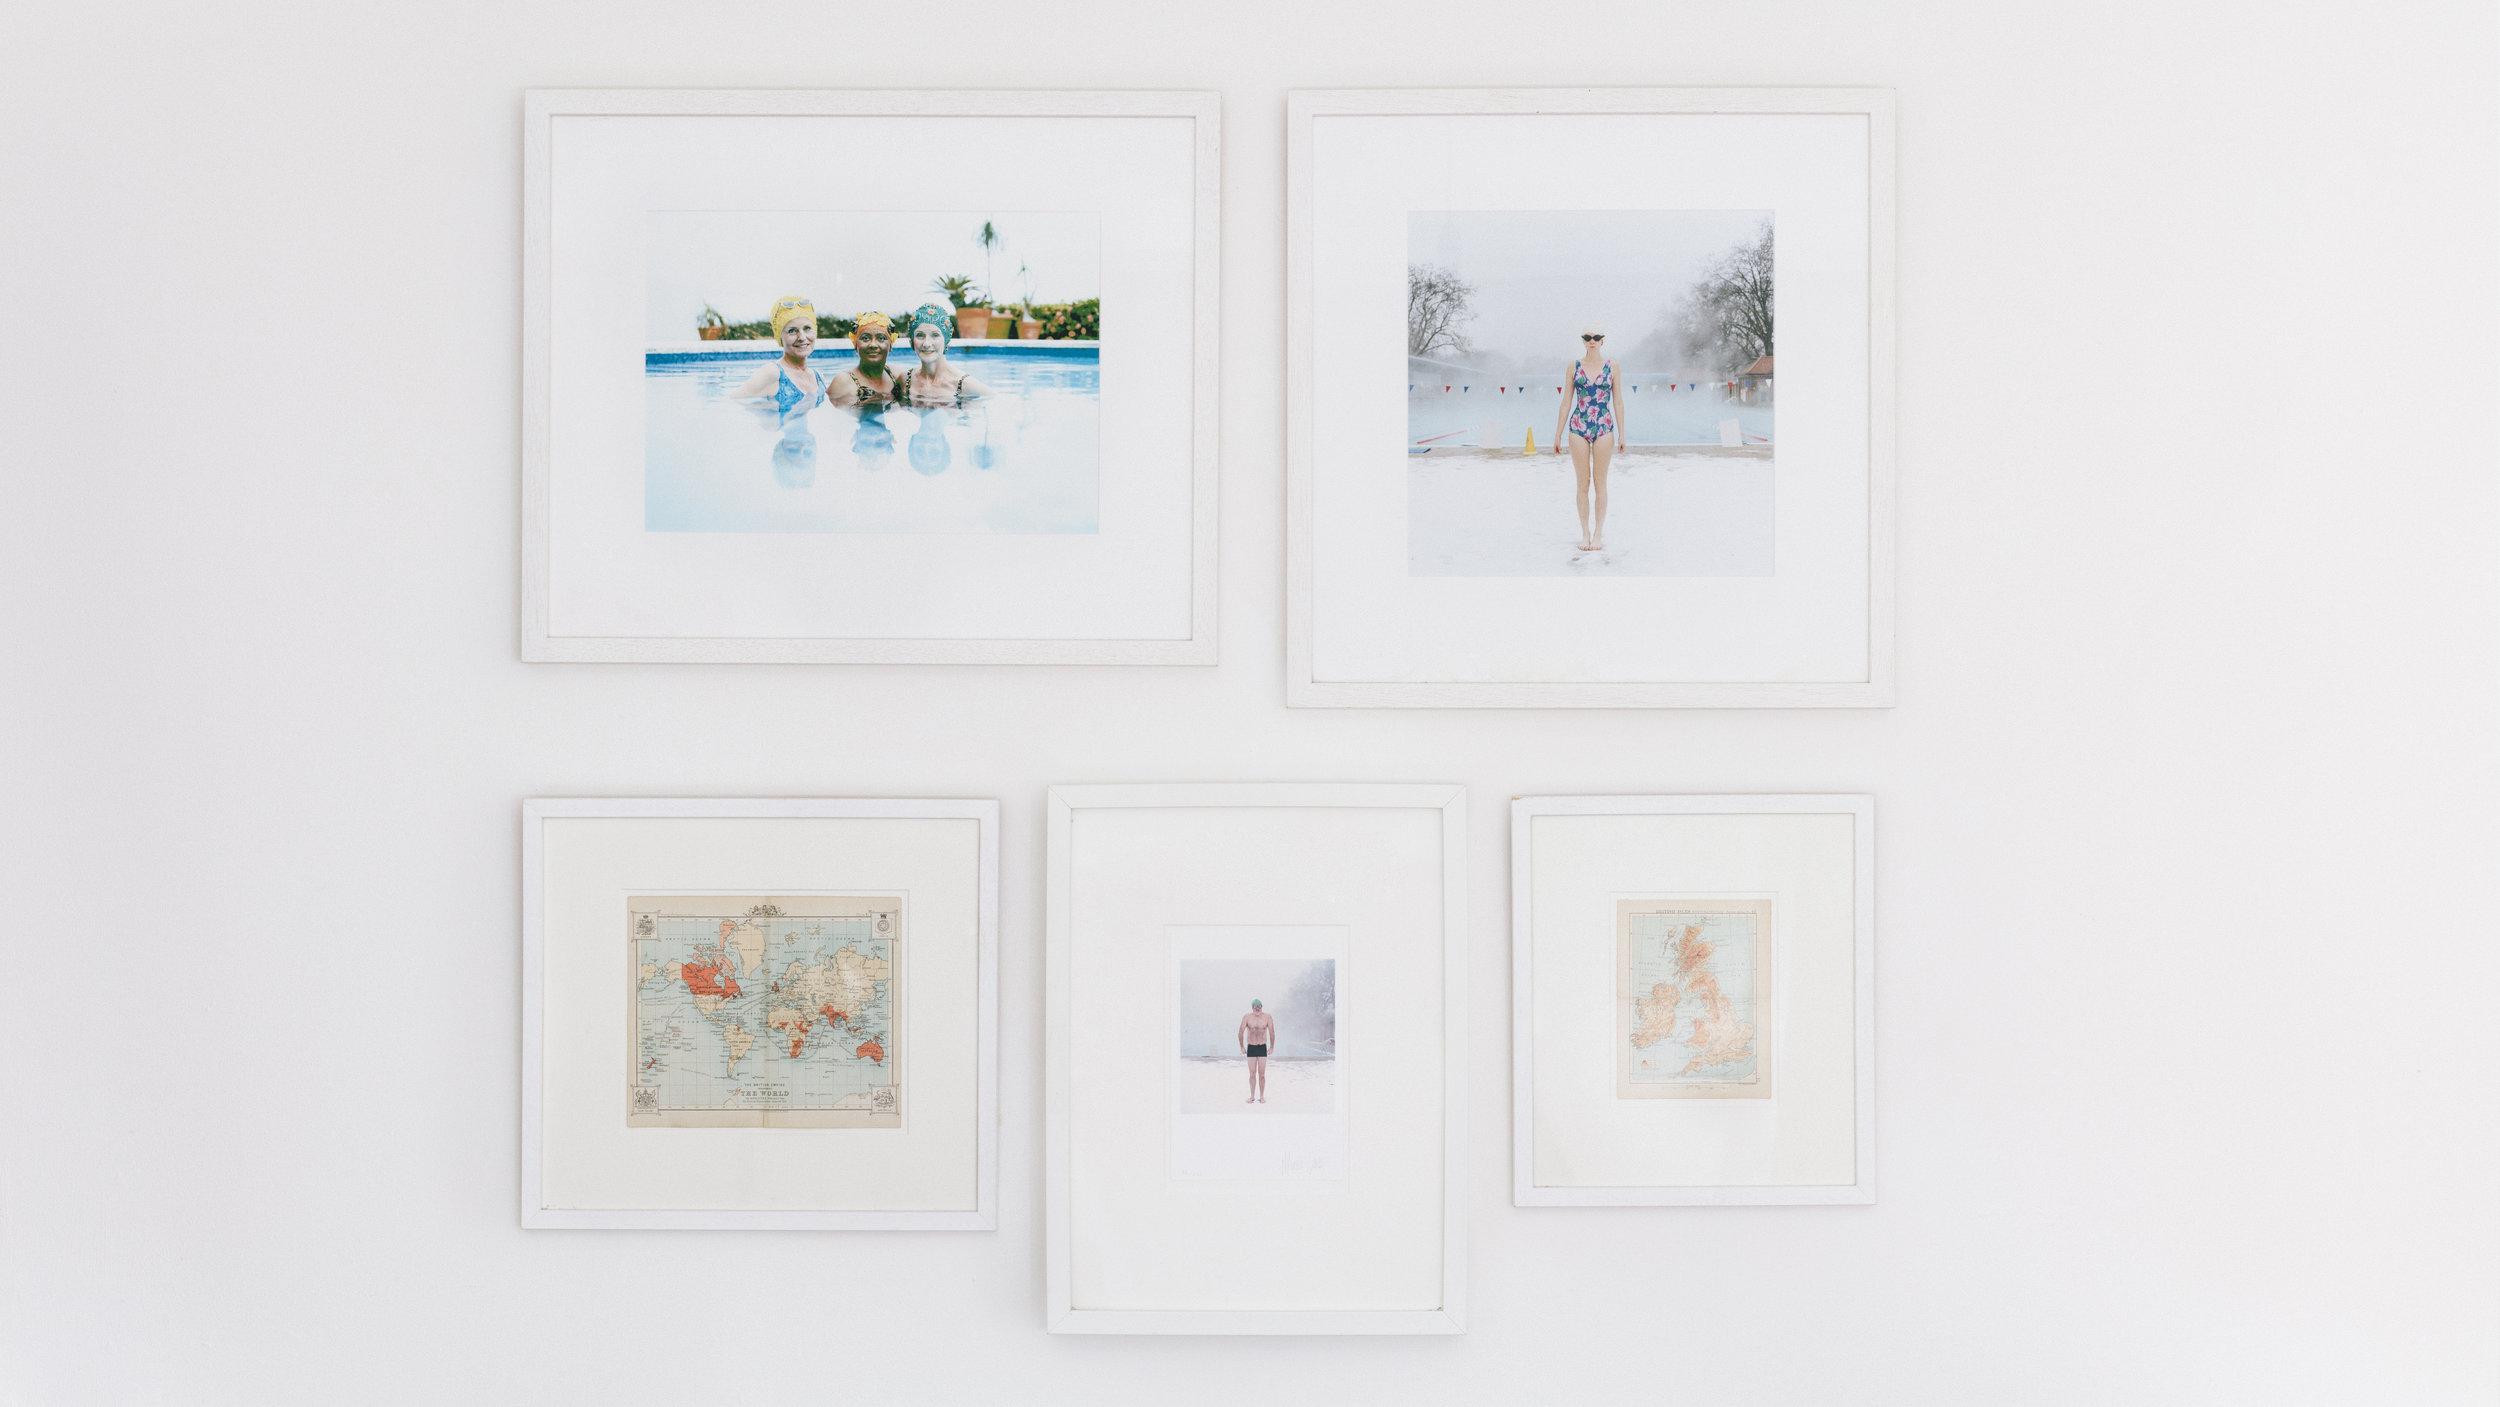 Swimming_Lido_Prints - Gallery_Wall